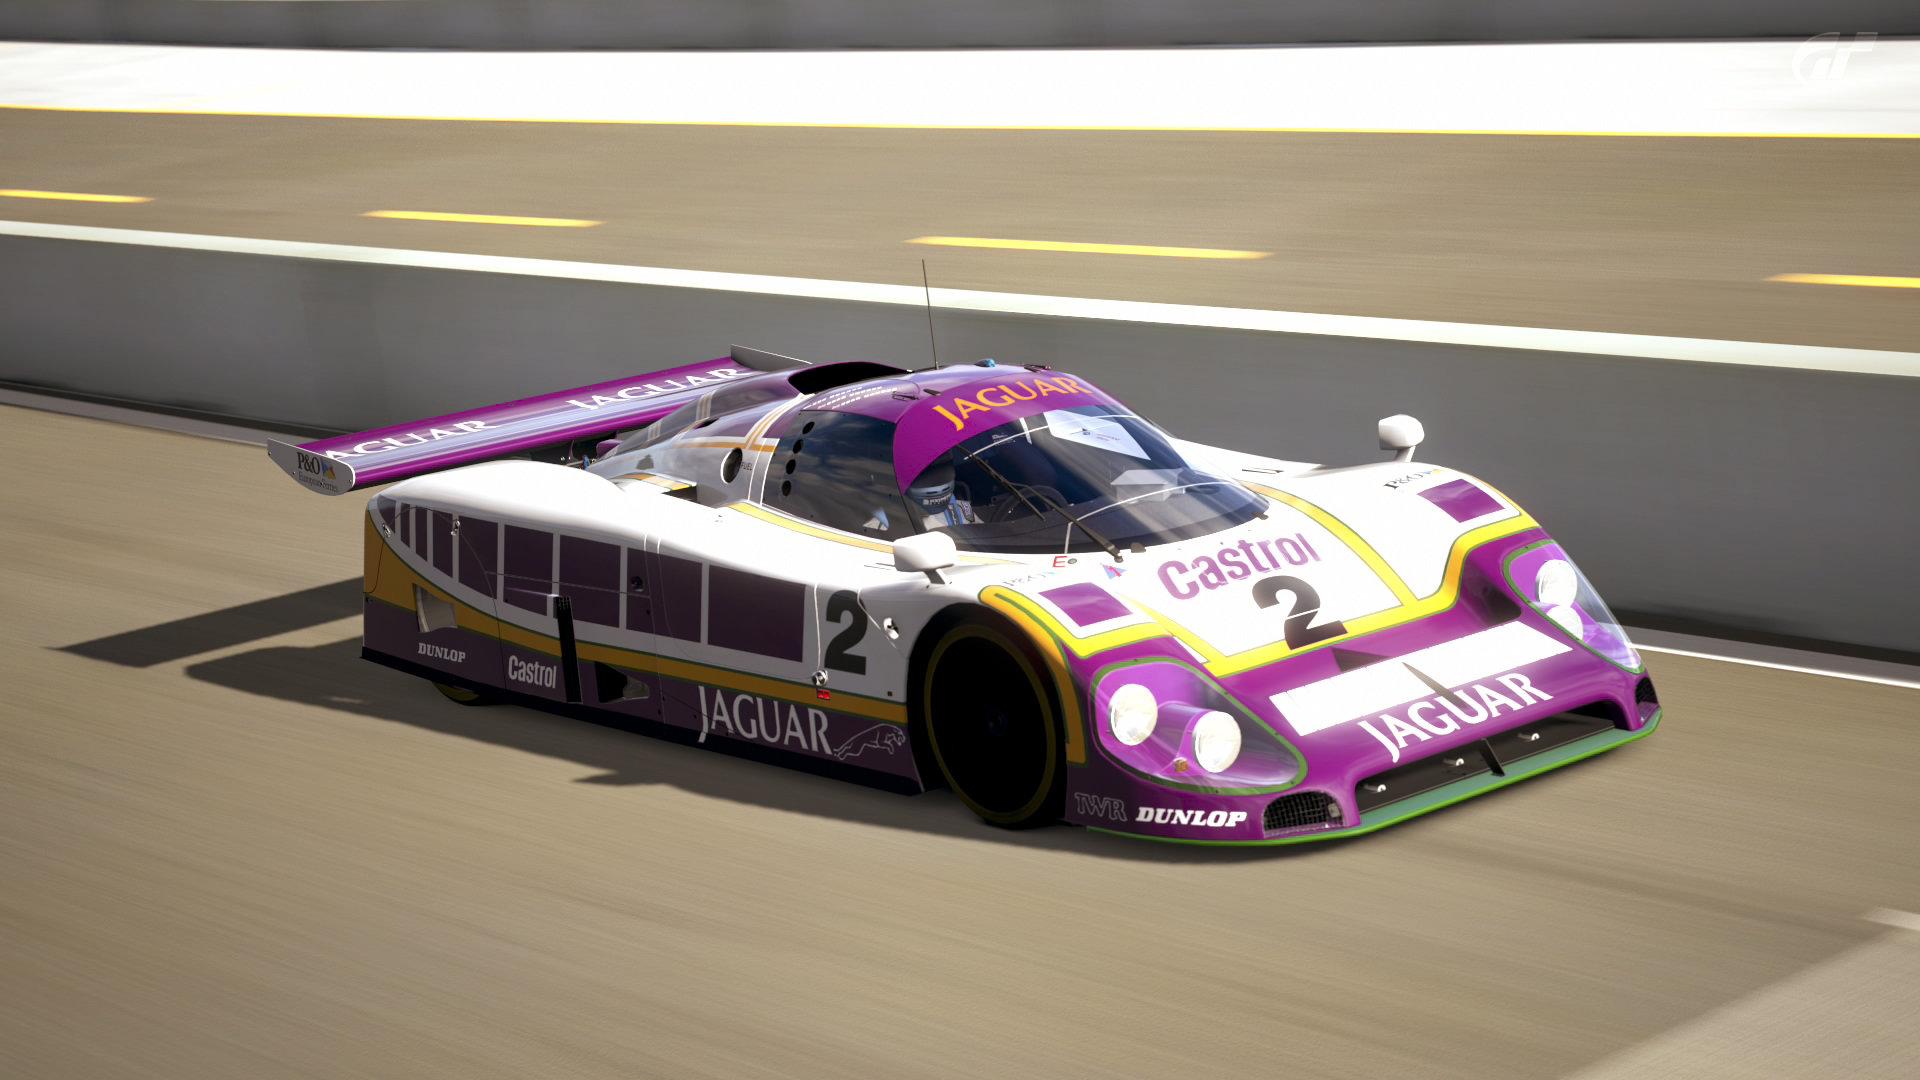 Obrázky z DLC pro Gran Turismo 5 58965